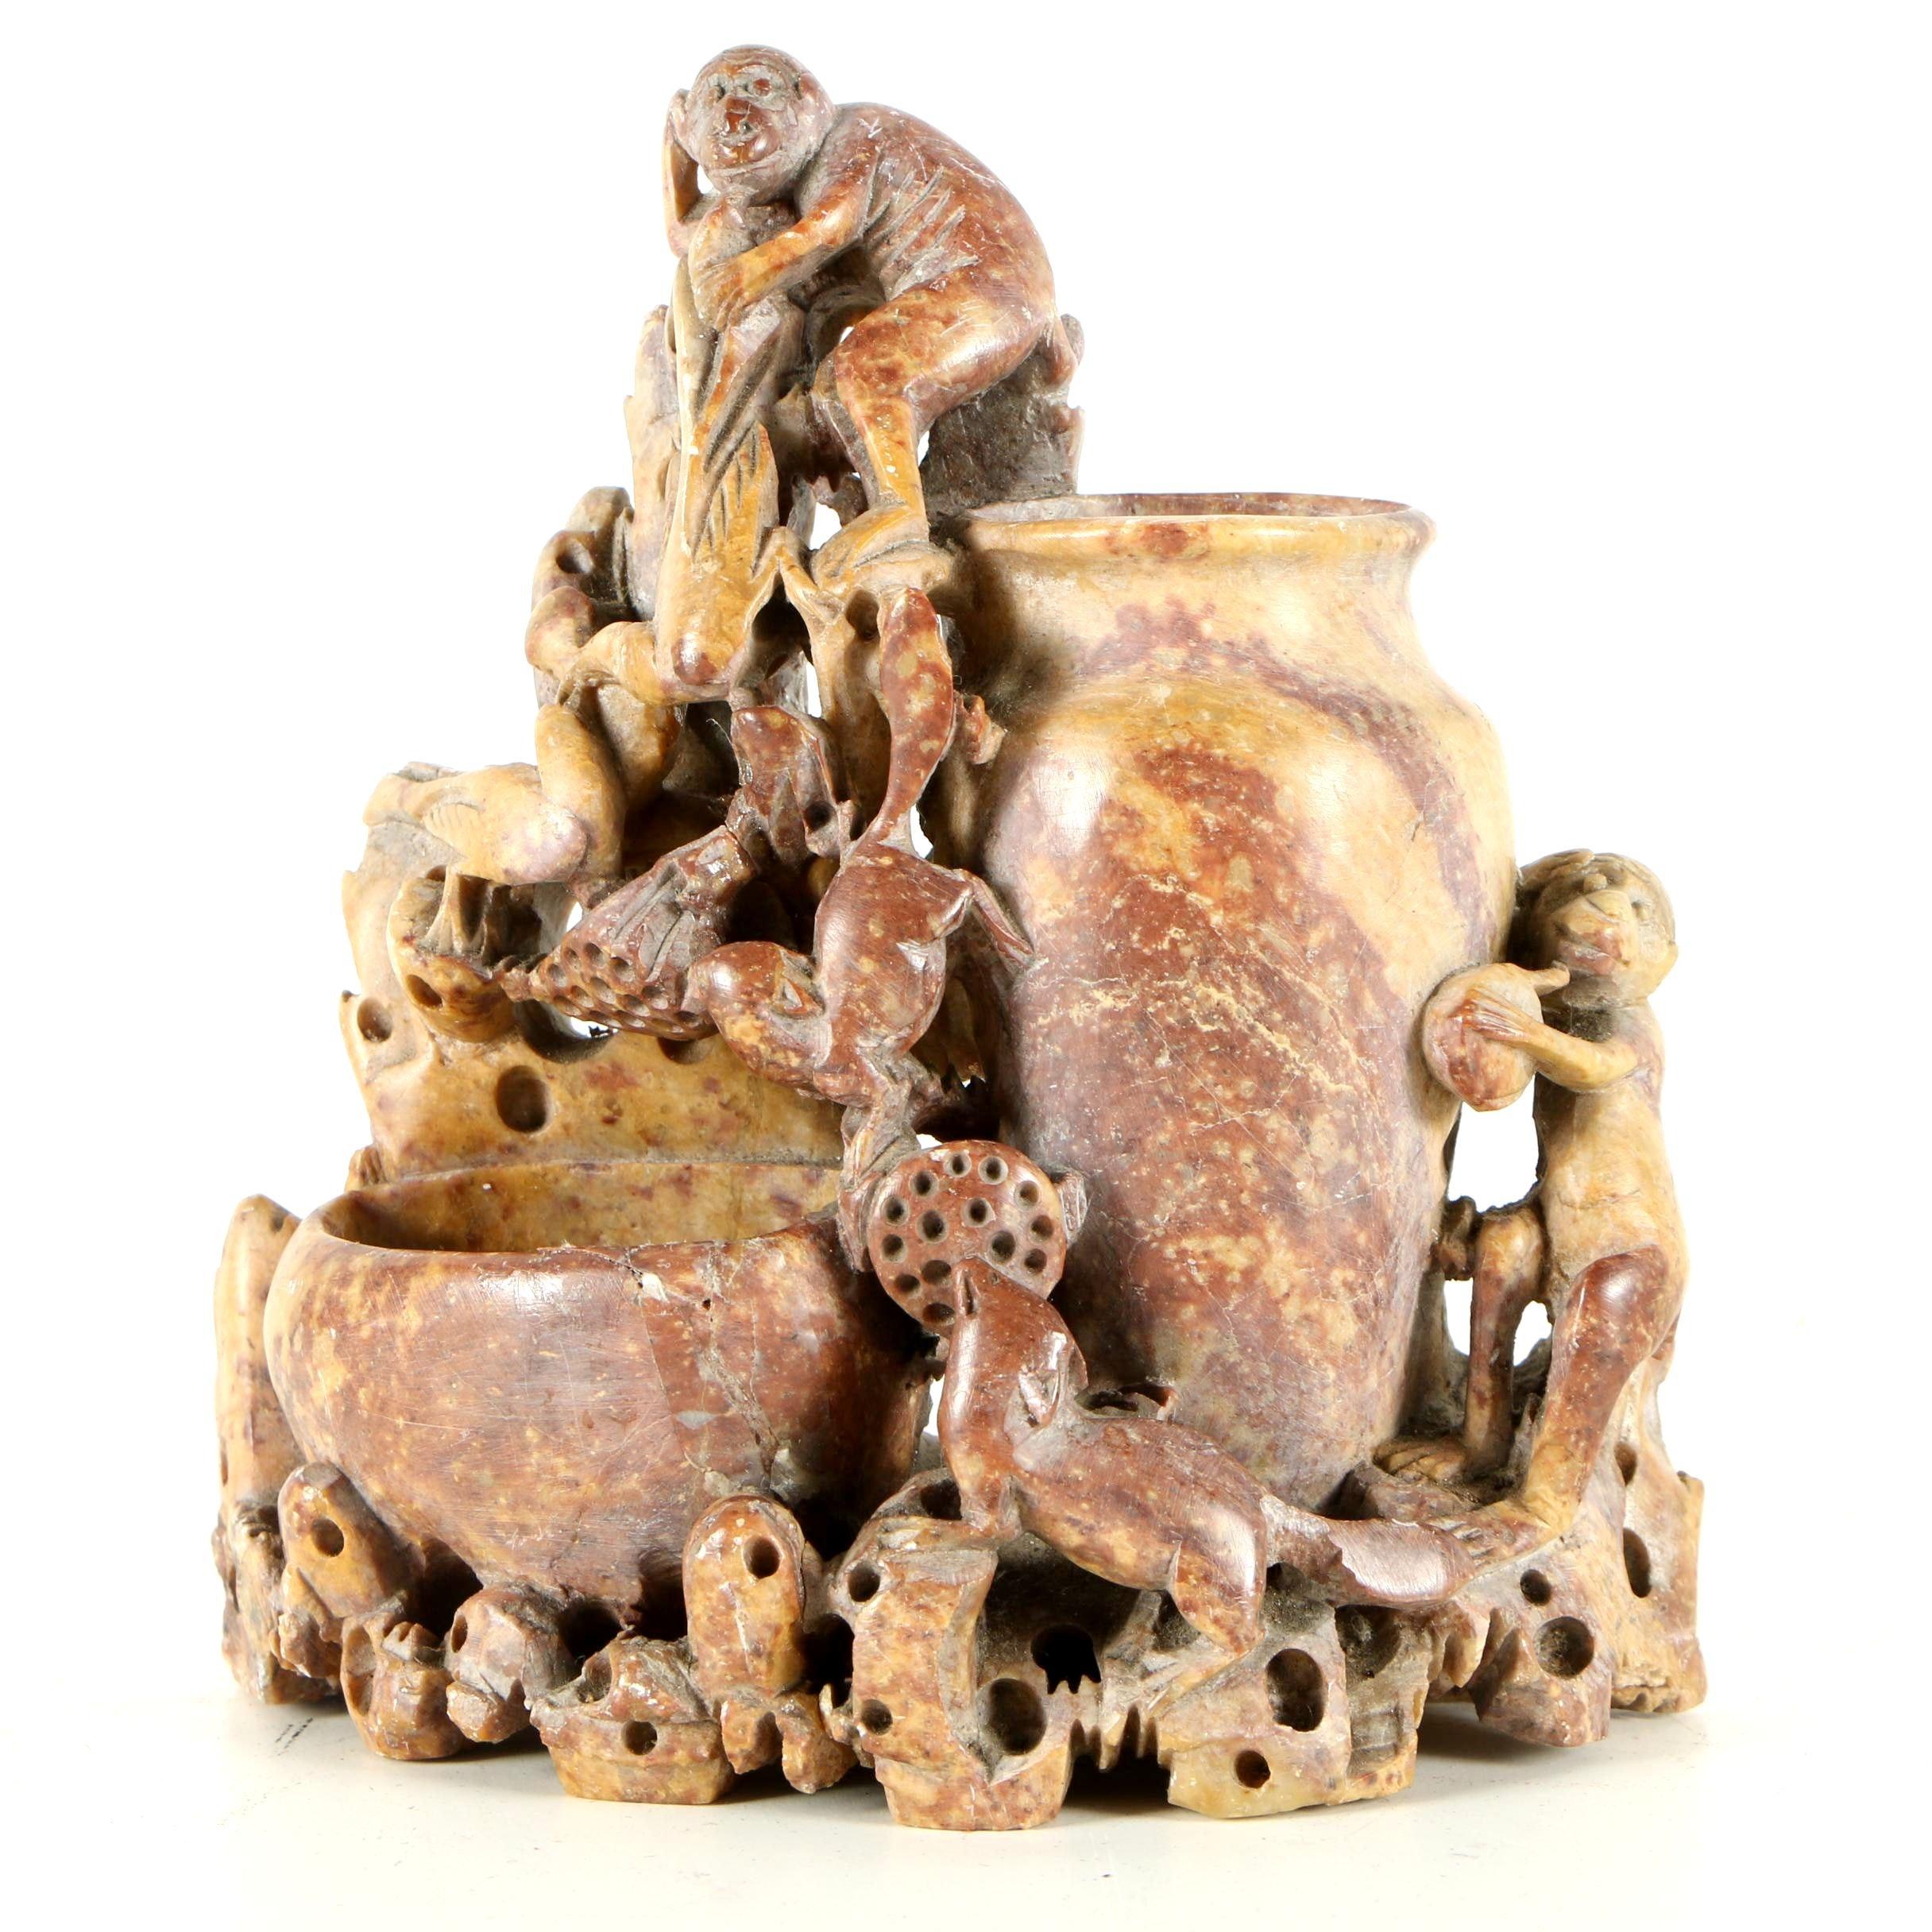 Chinese Soapstone Inkwell with Monkeys